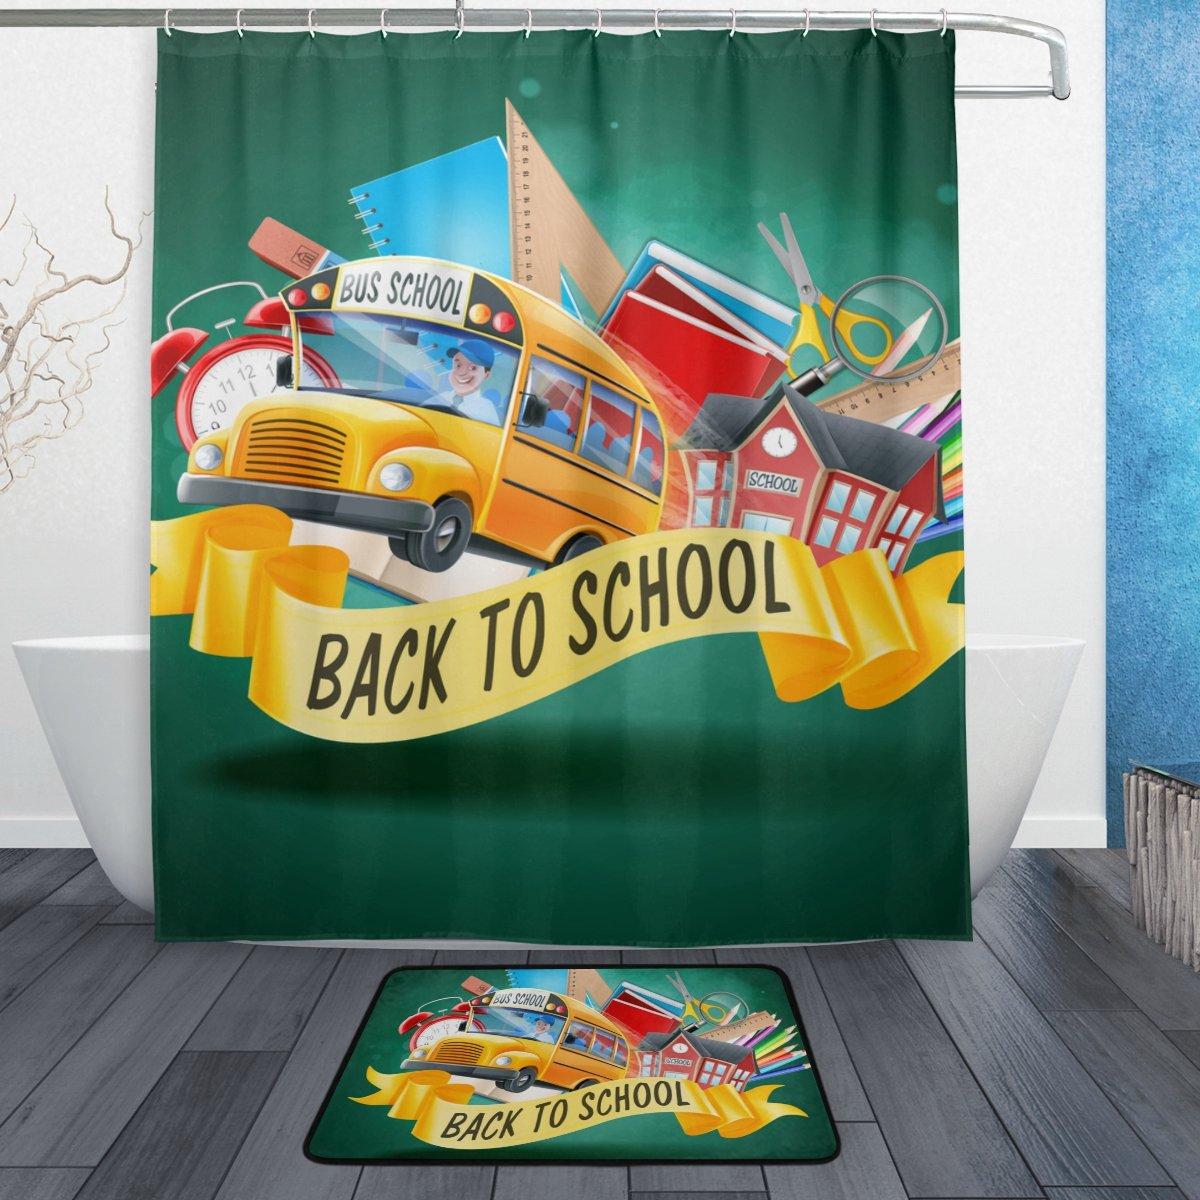 U LIFE Welcome Hello Back To School Season Bus Shower Curtain Set and Bathroom Area Rugs Mats 60 x 72 inch